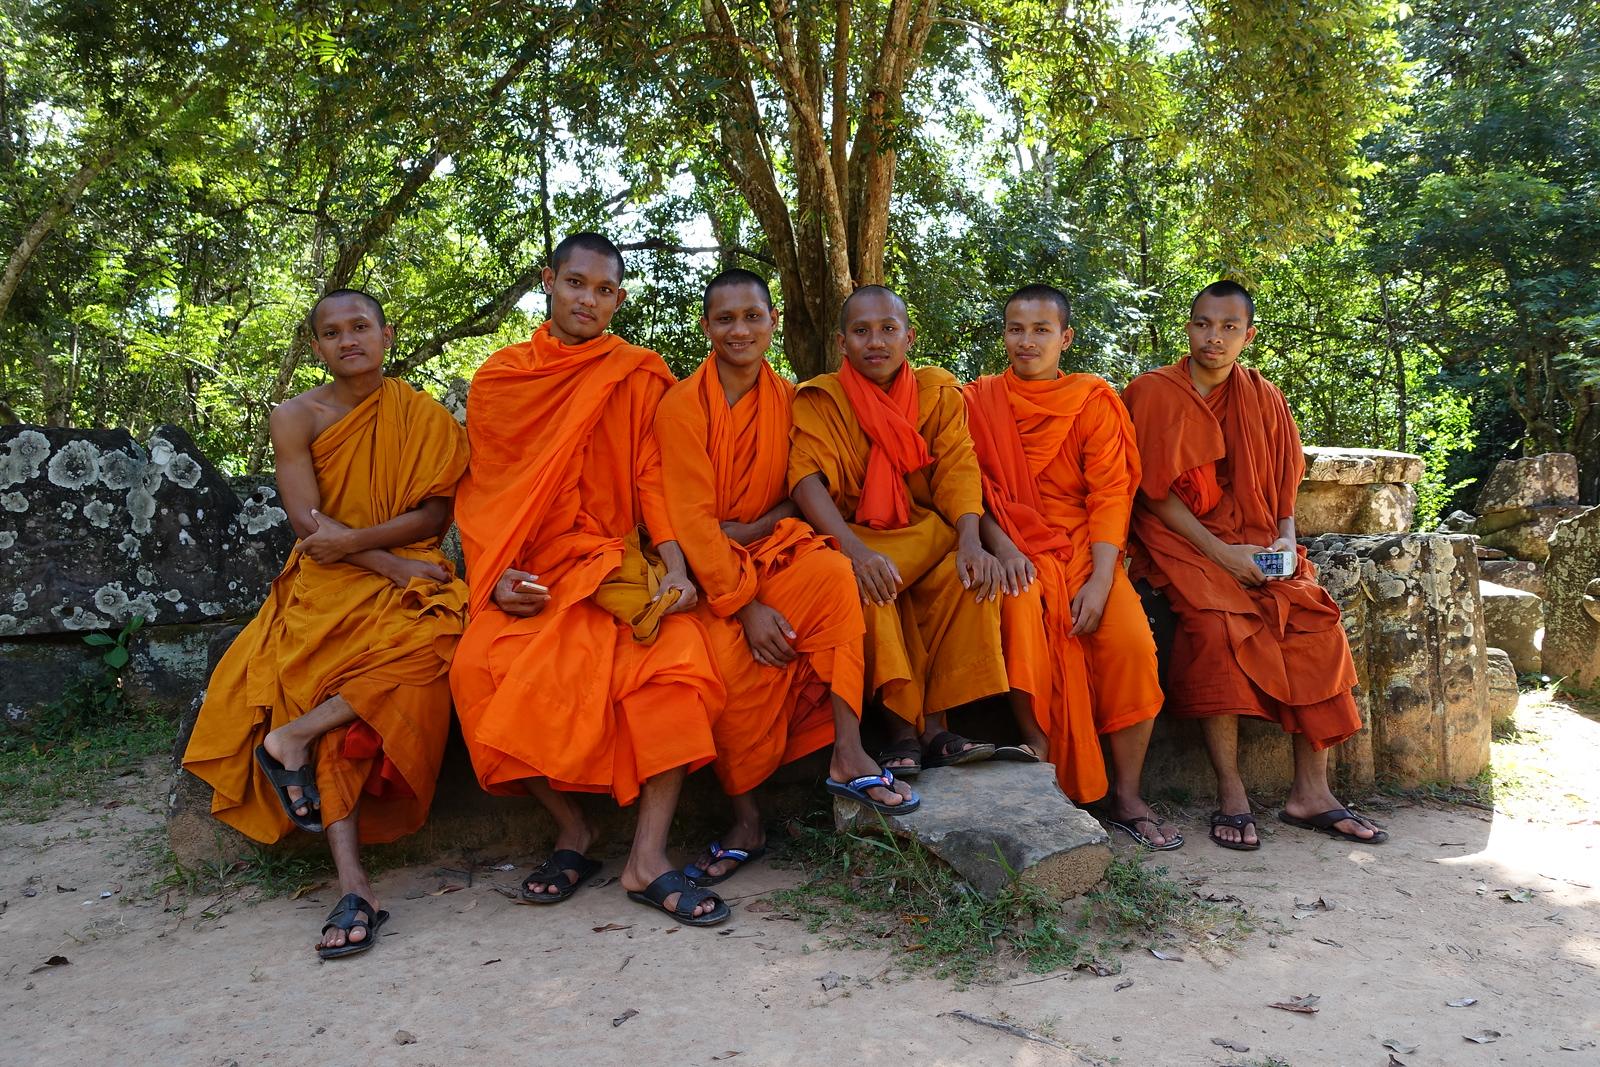 Siem Reap – Angkor – Banteay Kdei